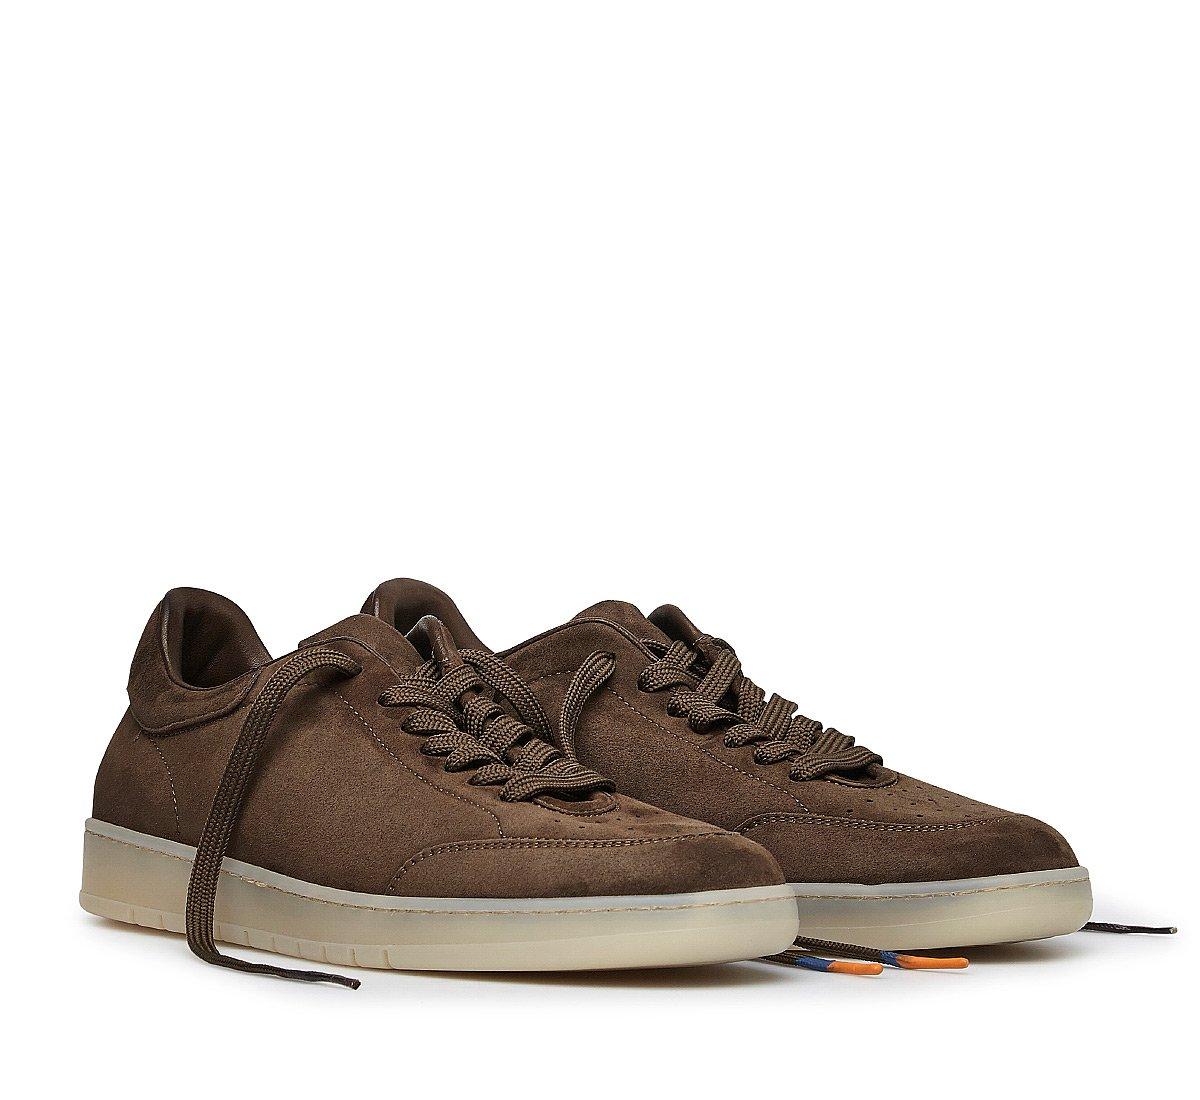 Barracuda GUGA sneakers